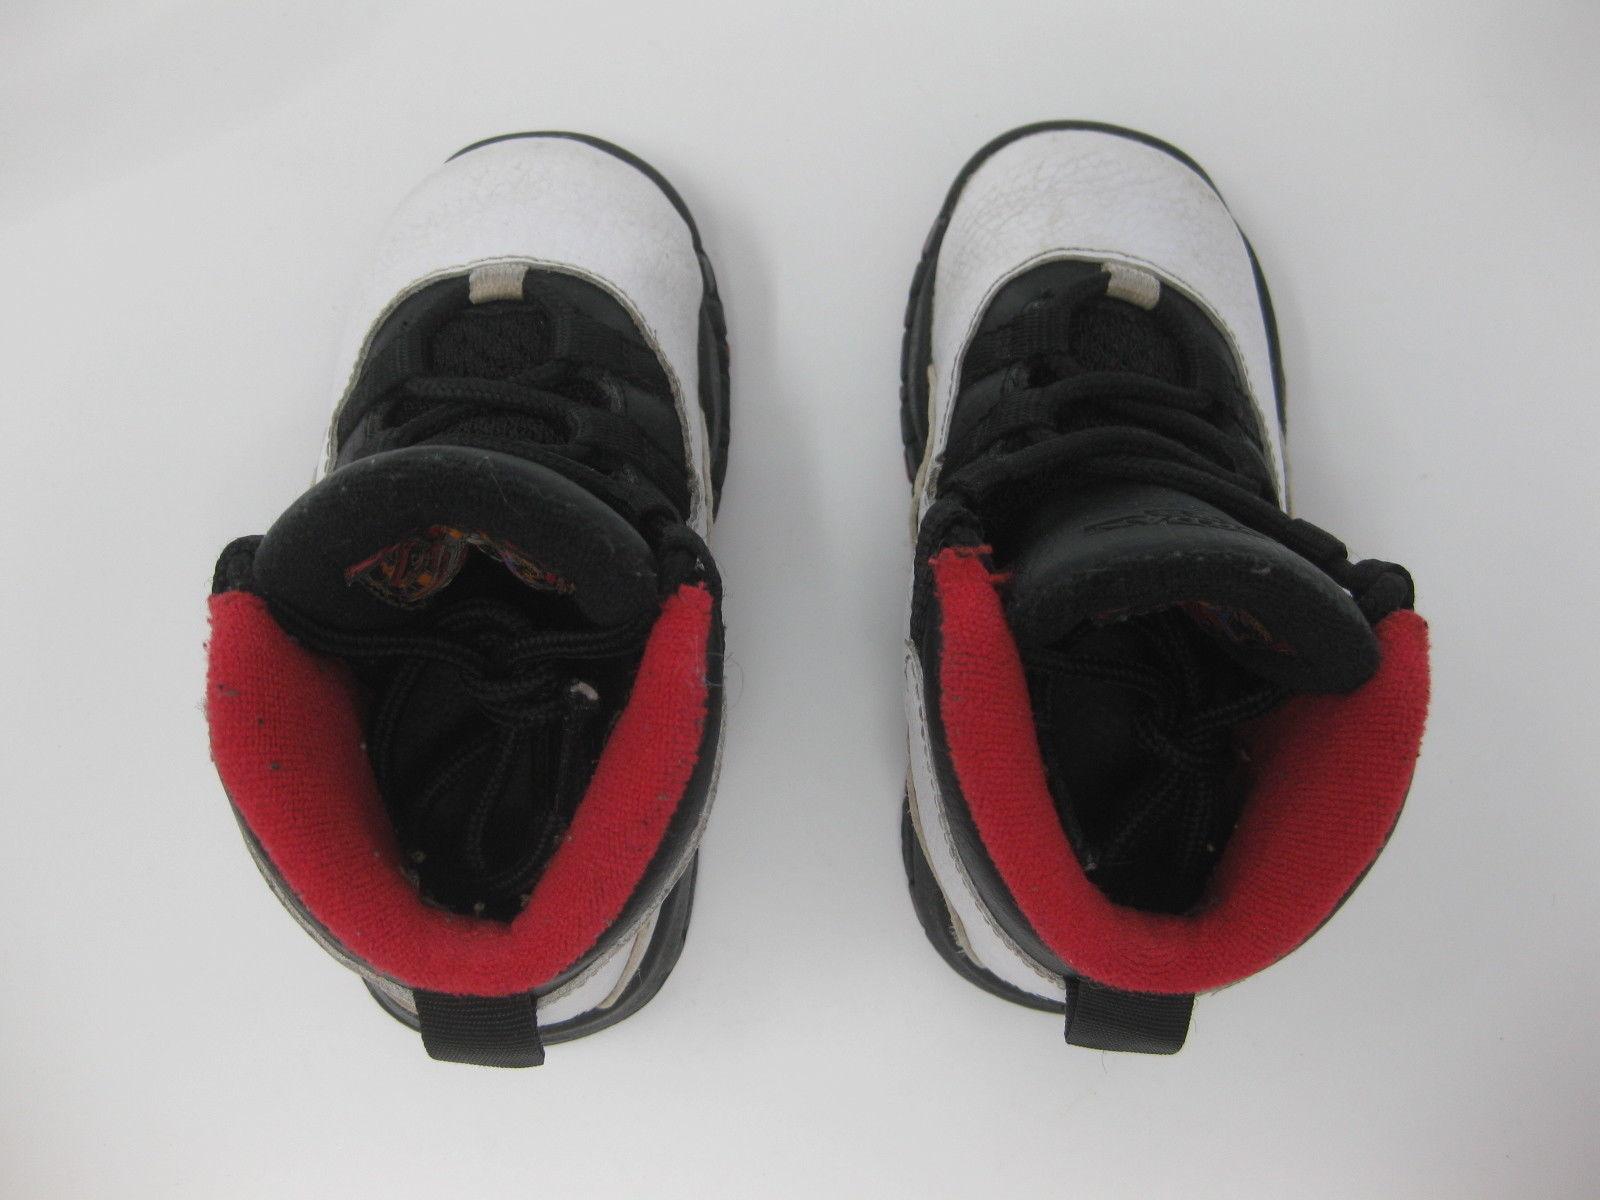 online retailer b0475 58a4b Nike Air Jordan X 10 Retro Double Nickel White Black 310808-102 Toddler Size